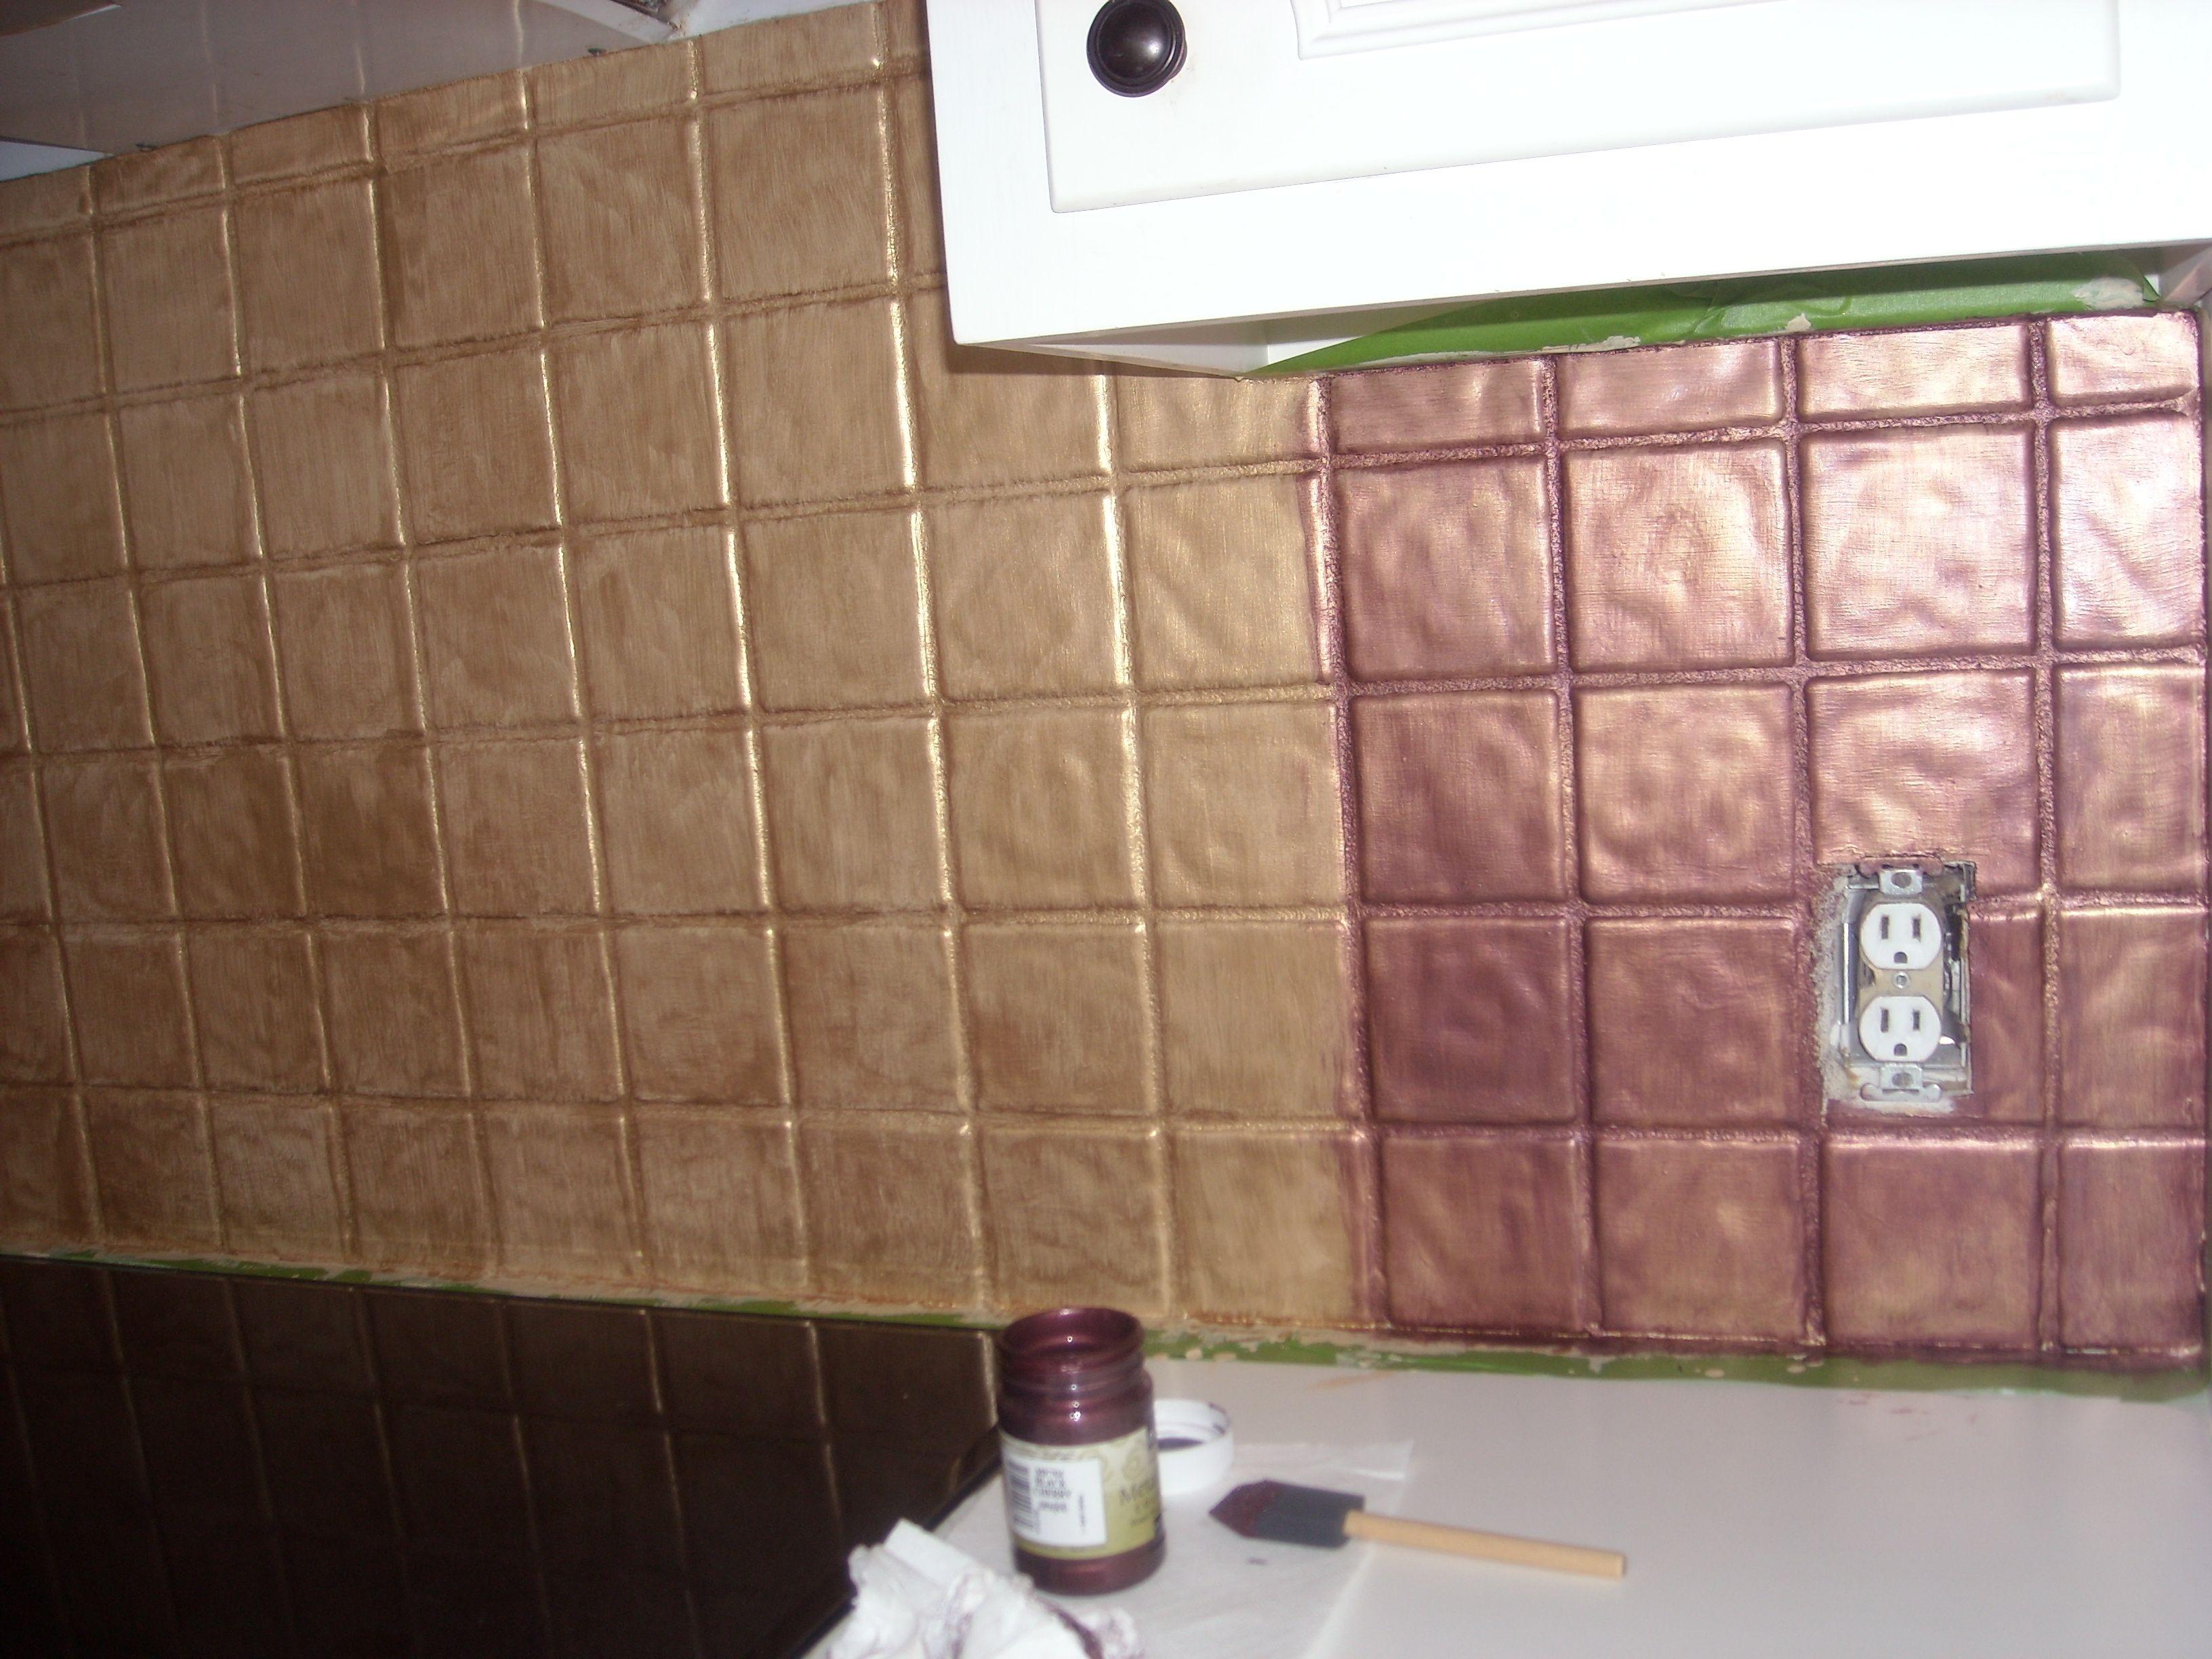 YES!!! You Can Paint Over Tile!! I Turned My Backsplash Kitchen